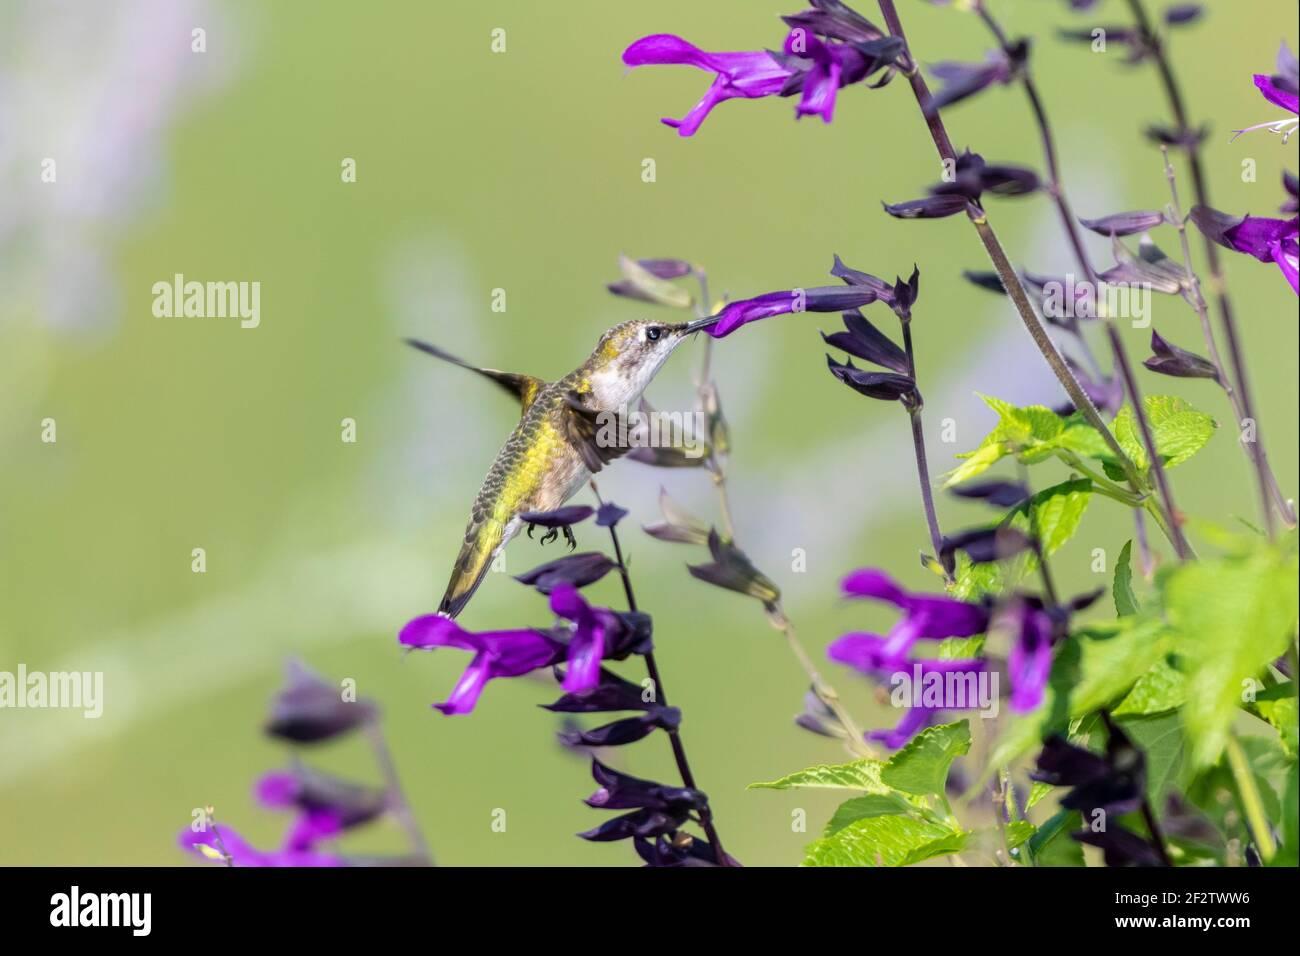 01162-16405 Rubinkehliger Kolibri (Archilochus colubris) bei Salvia 'Purple and Bloom' (Salvia Guaranitica) Marion Co. IL Stockfoto